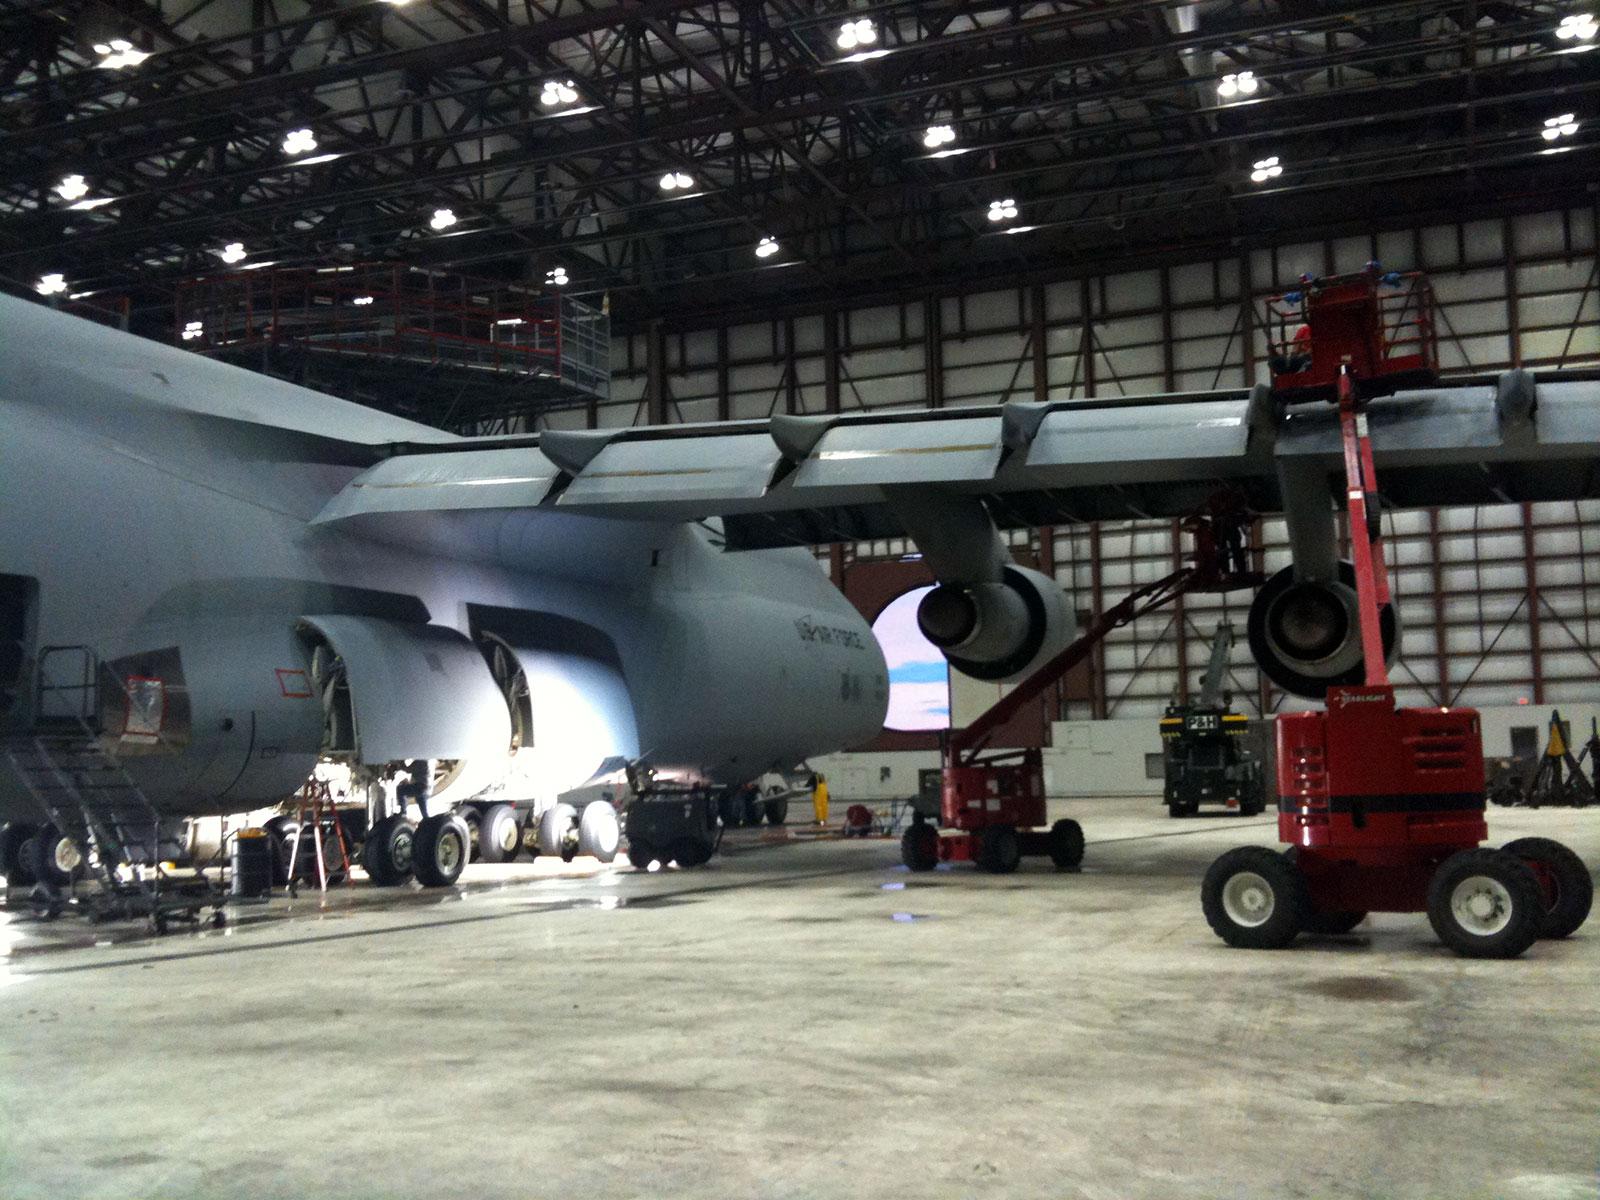 Civil Aircraft Exterior Washing Equipment Market